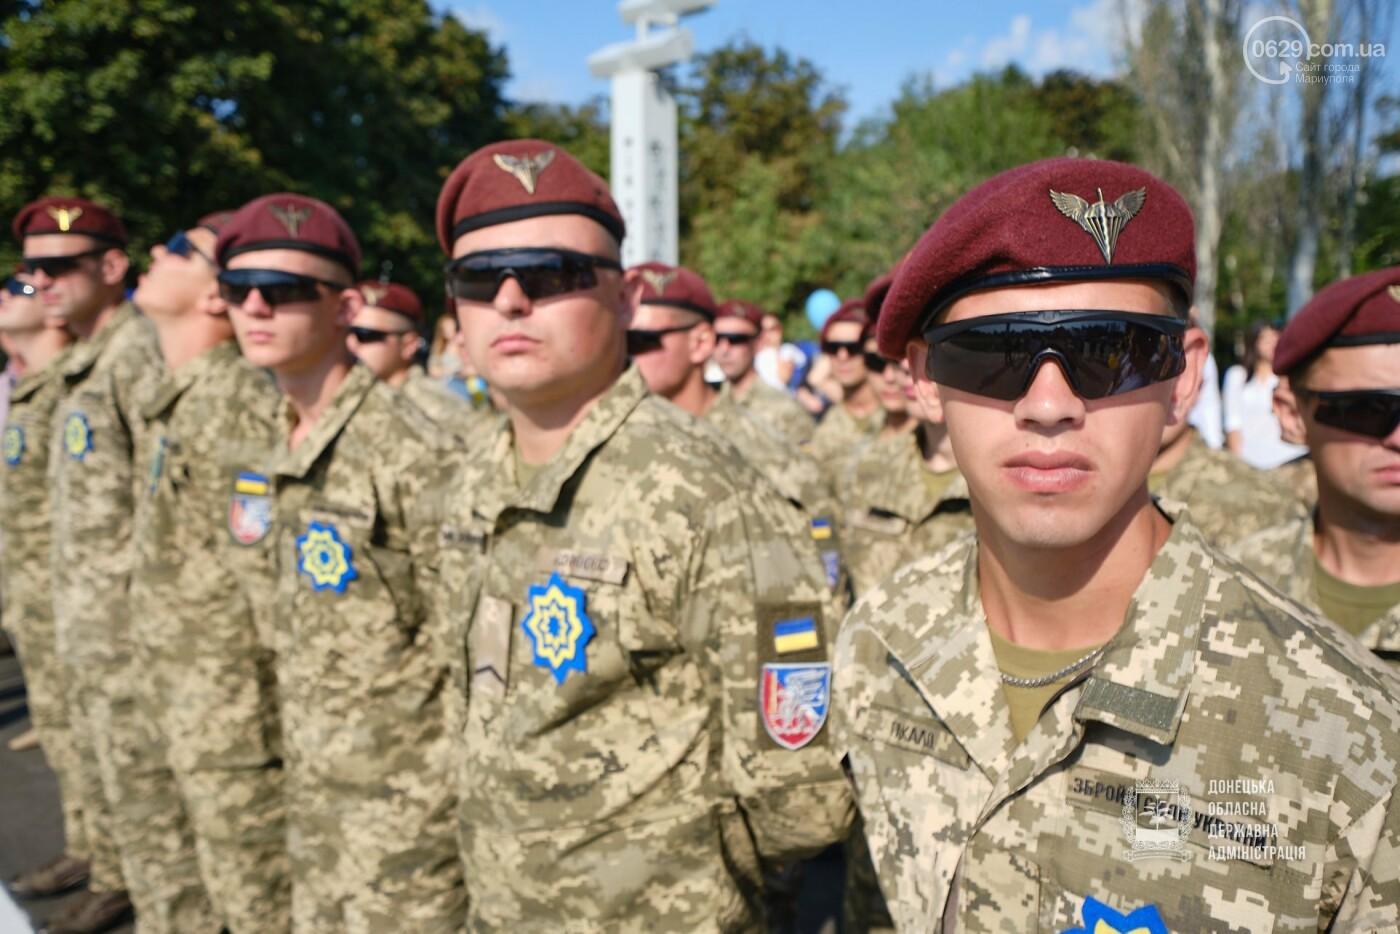 В Донецкой области подняли флаг Украины на 80 метров, - ФОТО, фото-5